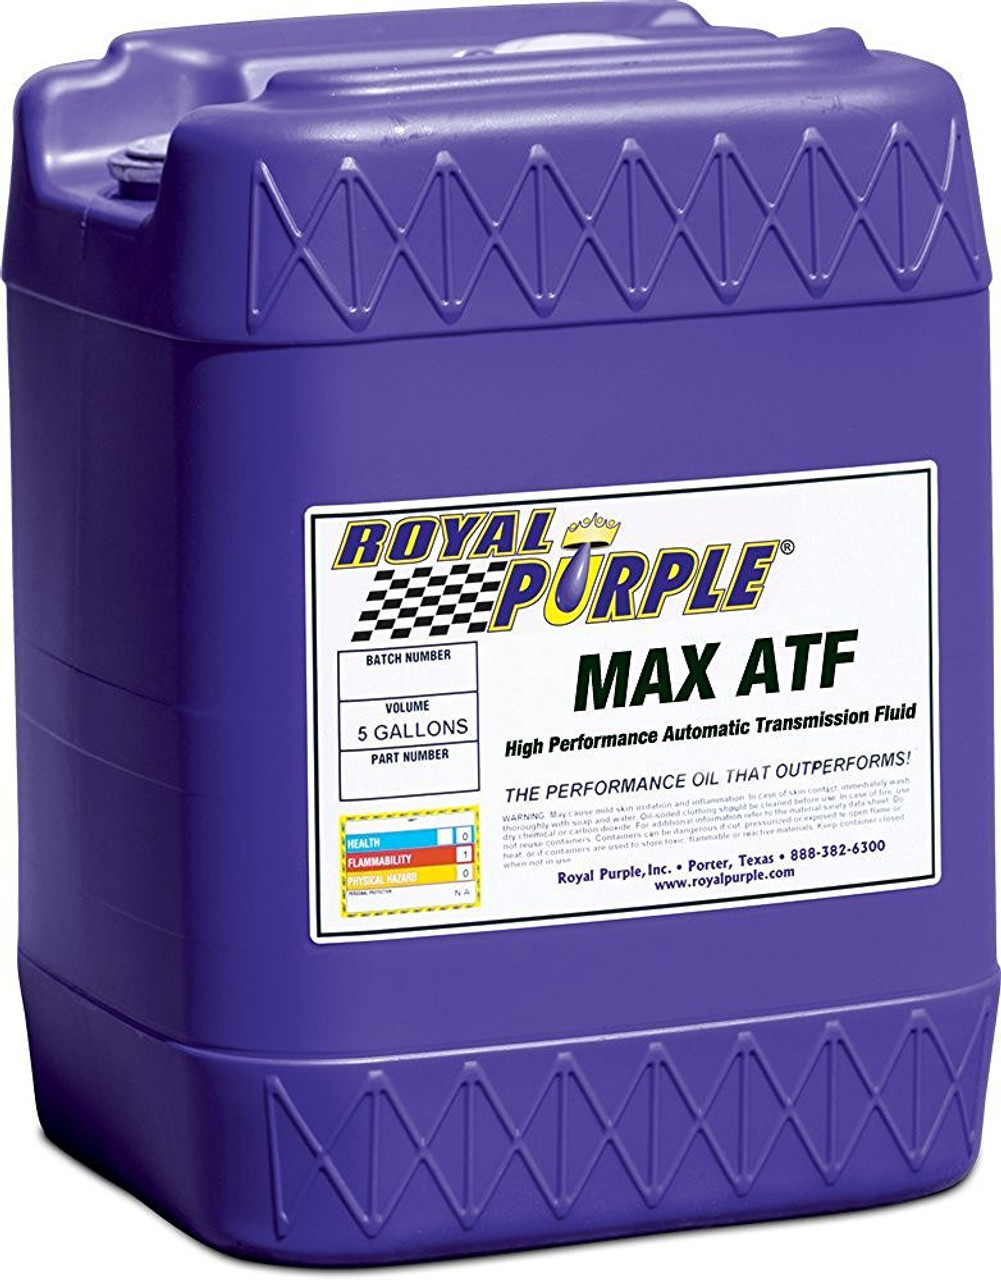 Royal Purple Max ATF Automatic Transmission Fluid